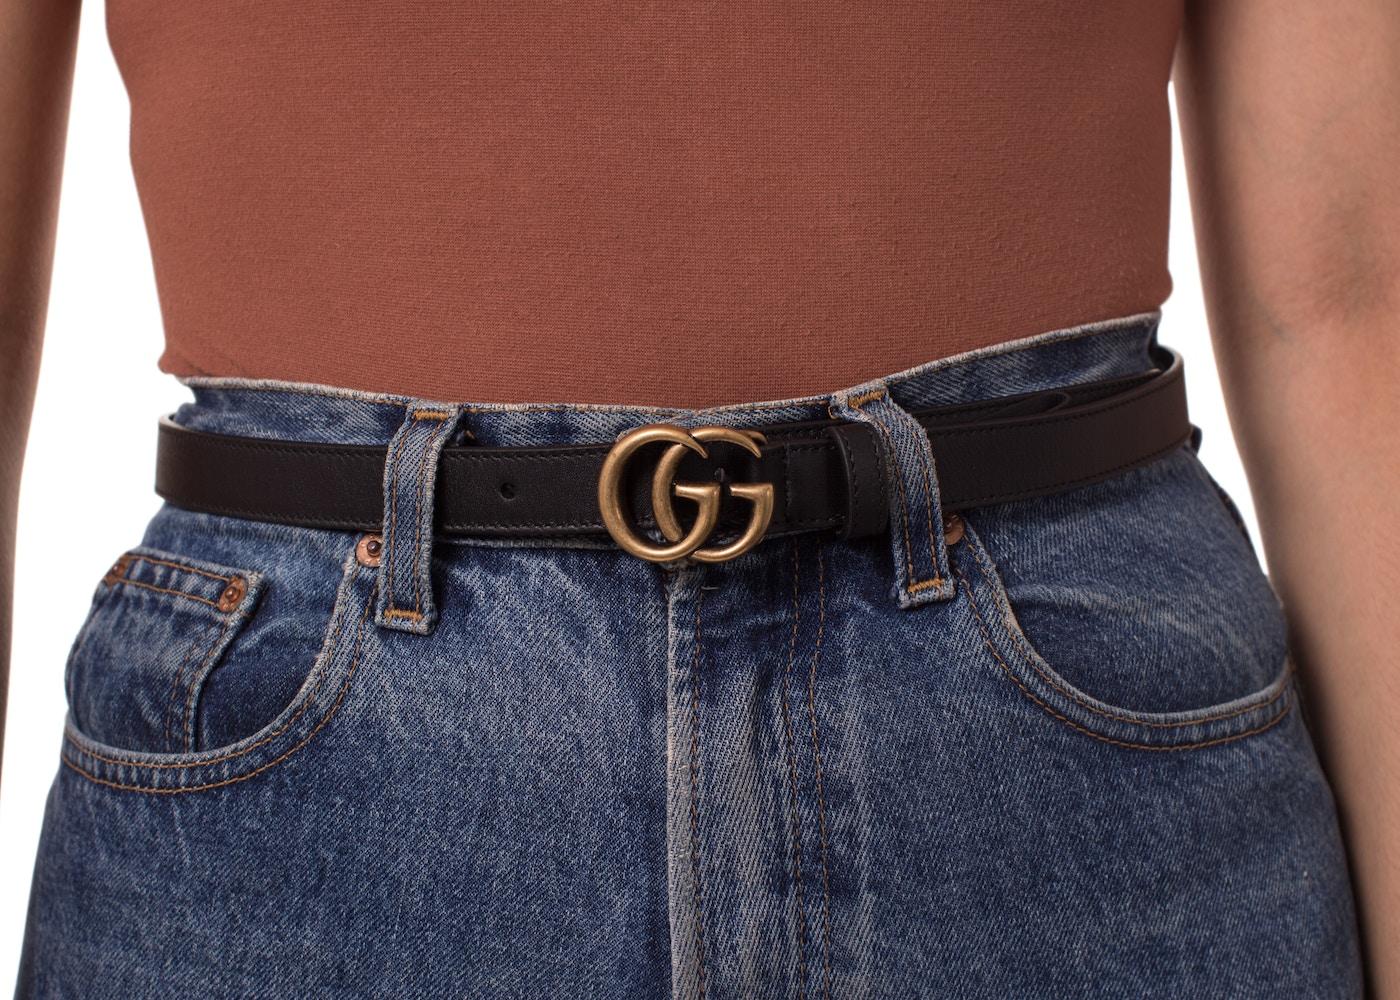 c3ce4b5a01b Gucci Double G Gold Buckle Leather Belt 0.8 Width Black